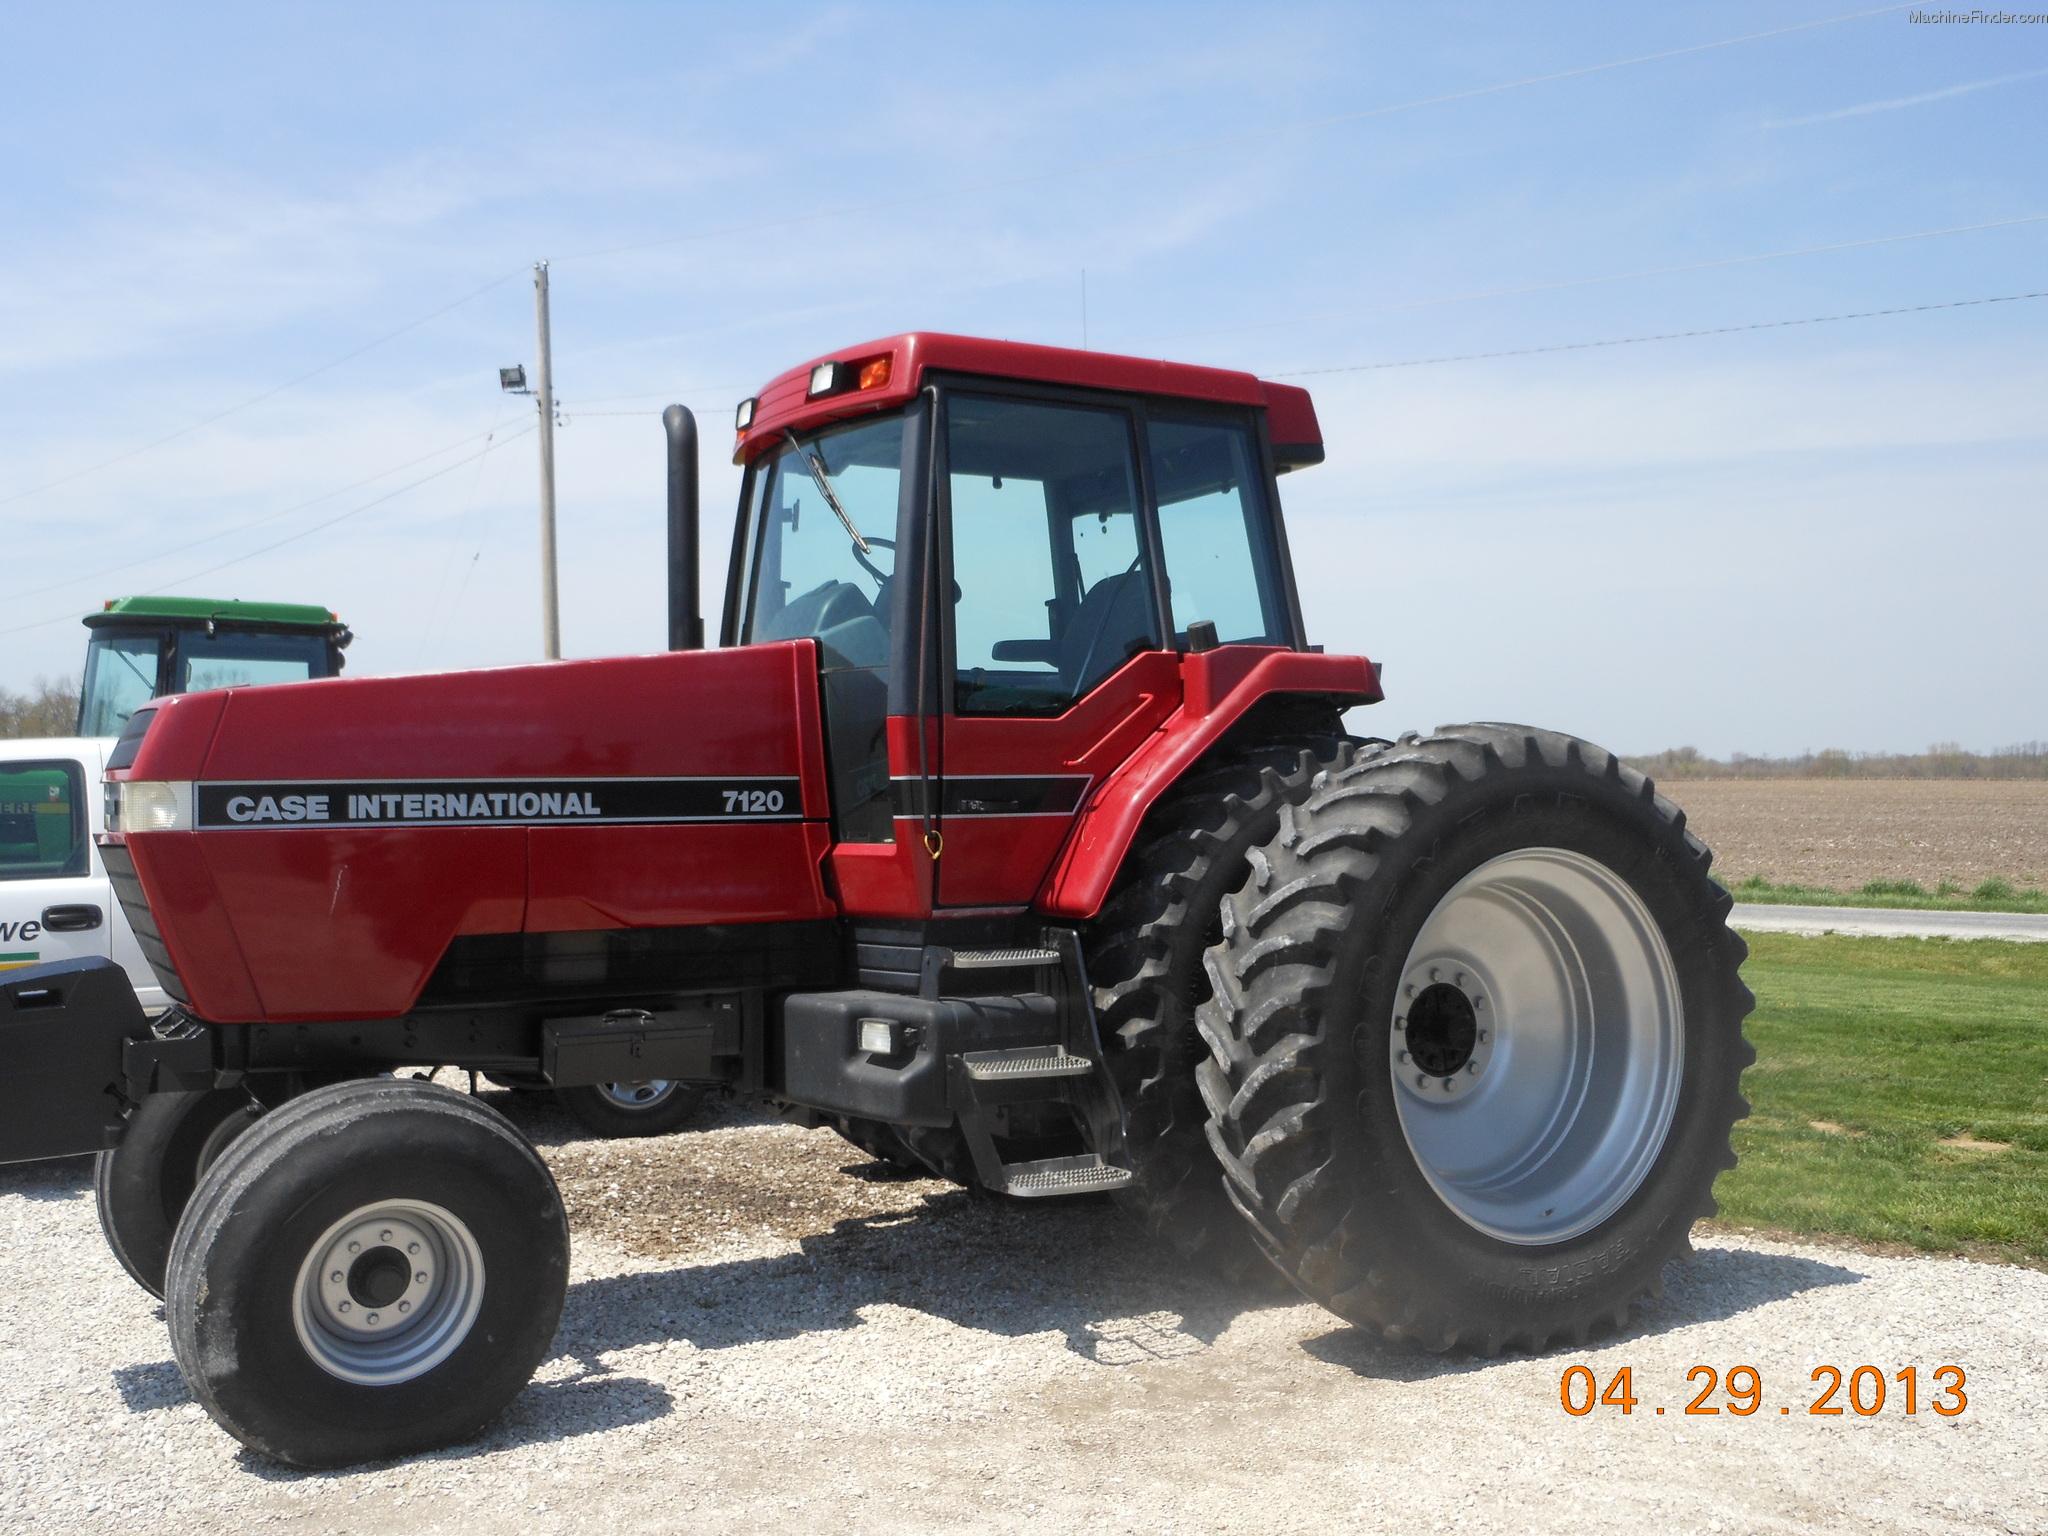 Case Ih 7120 : Case ih tractors row crop hp john